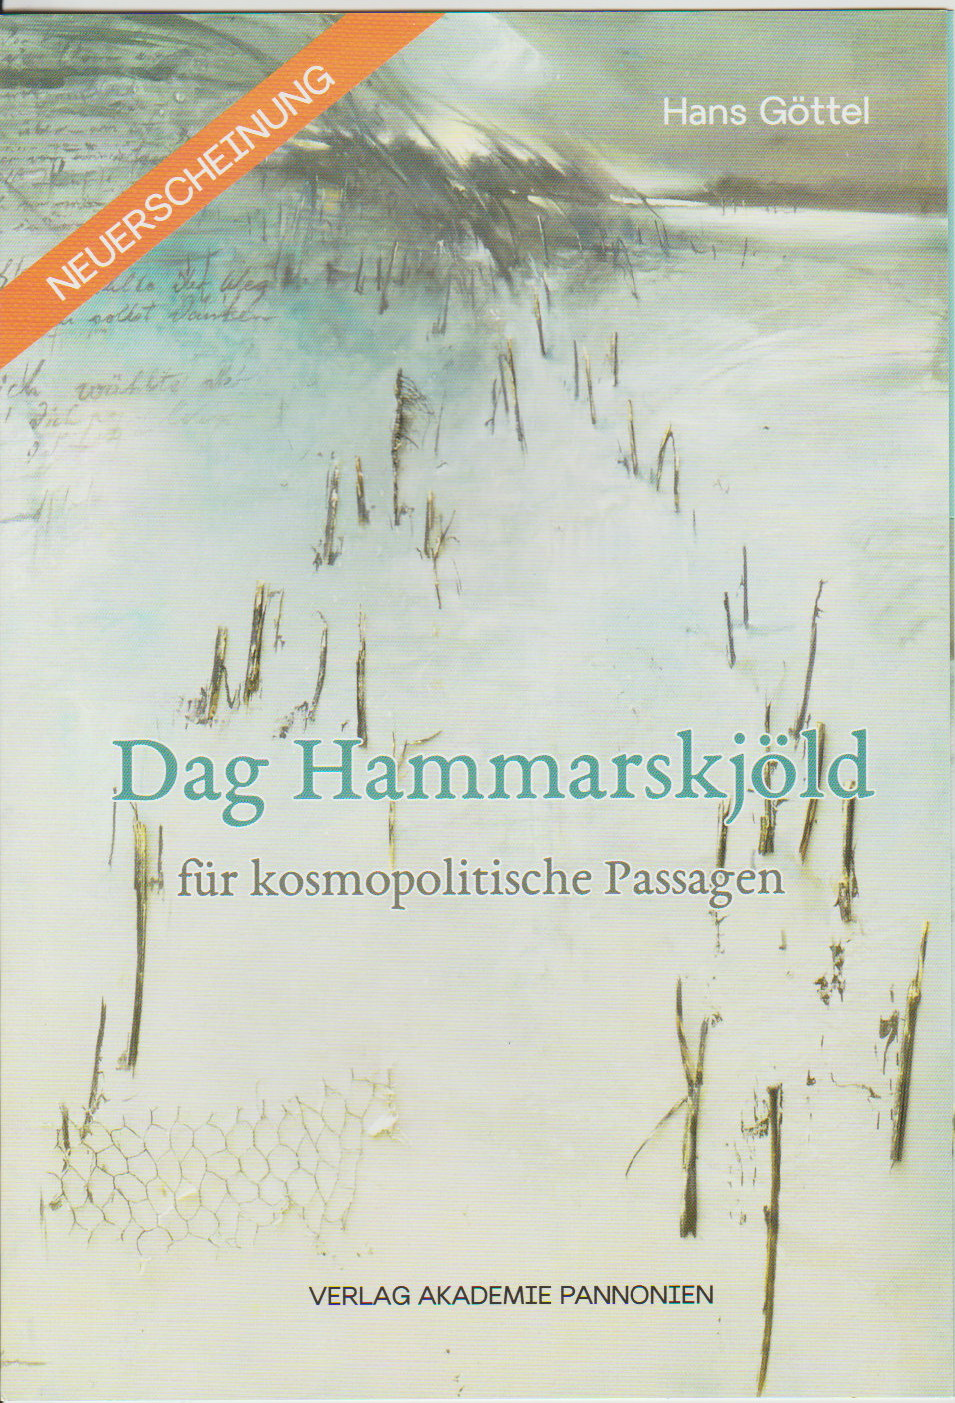 Dag Hammarskjoeld